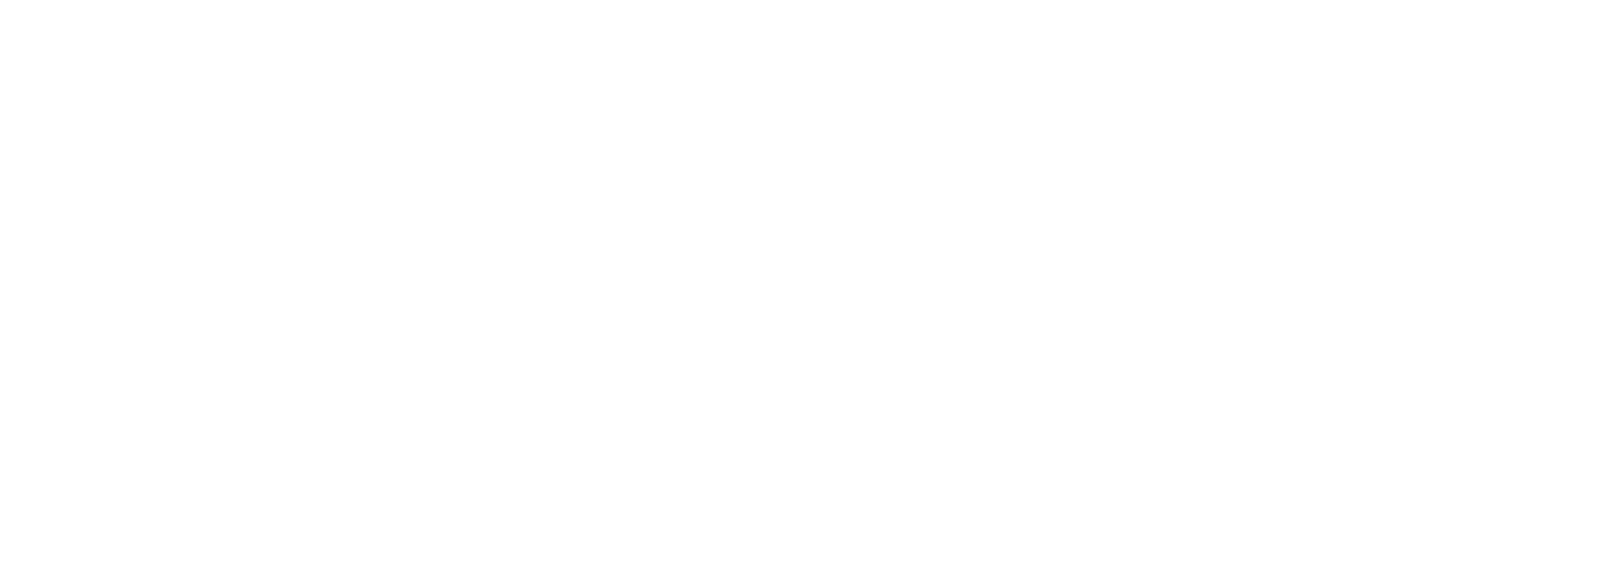 crownvideos.co.uk